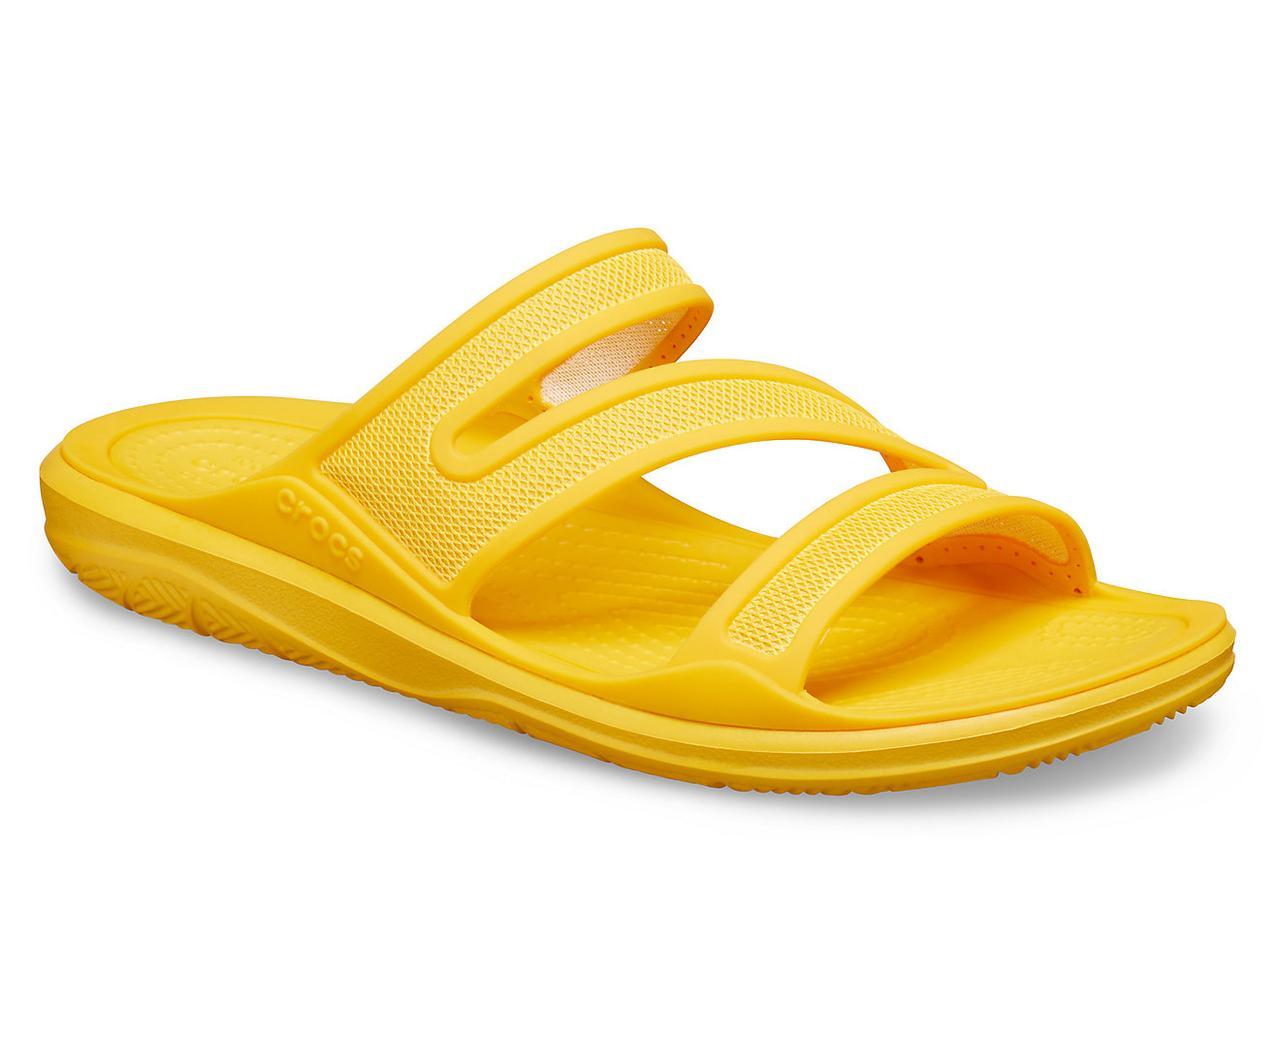 Шлепанцы женские сандалии Кроксы оригинал / Crocs Women's Swiftwater Telluride Sandal (206334), Желтые